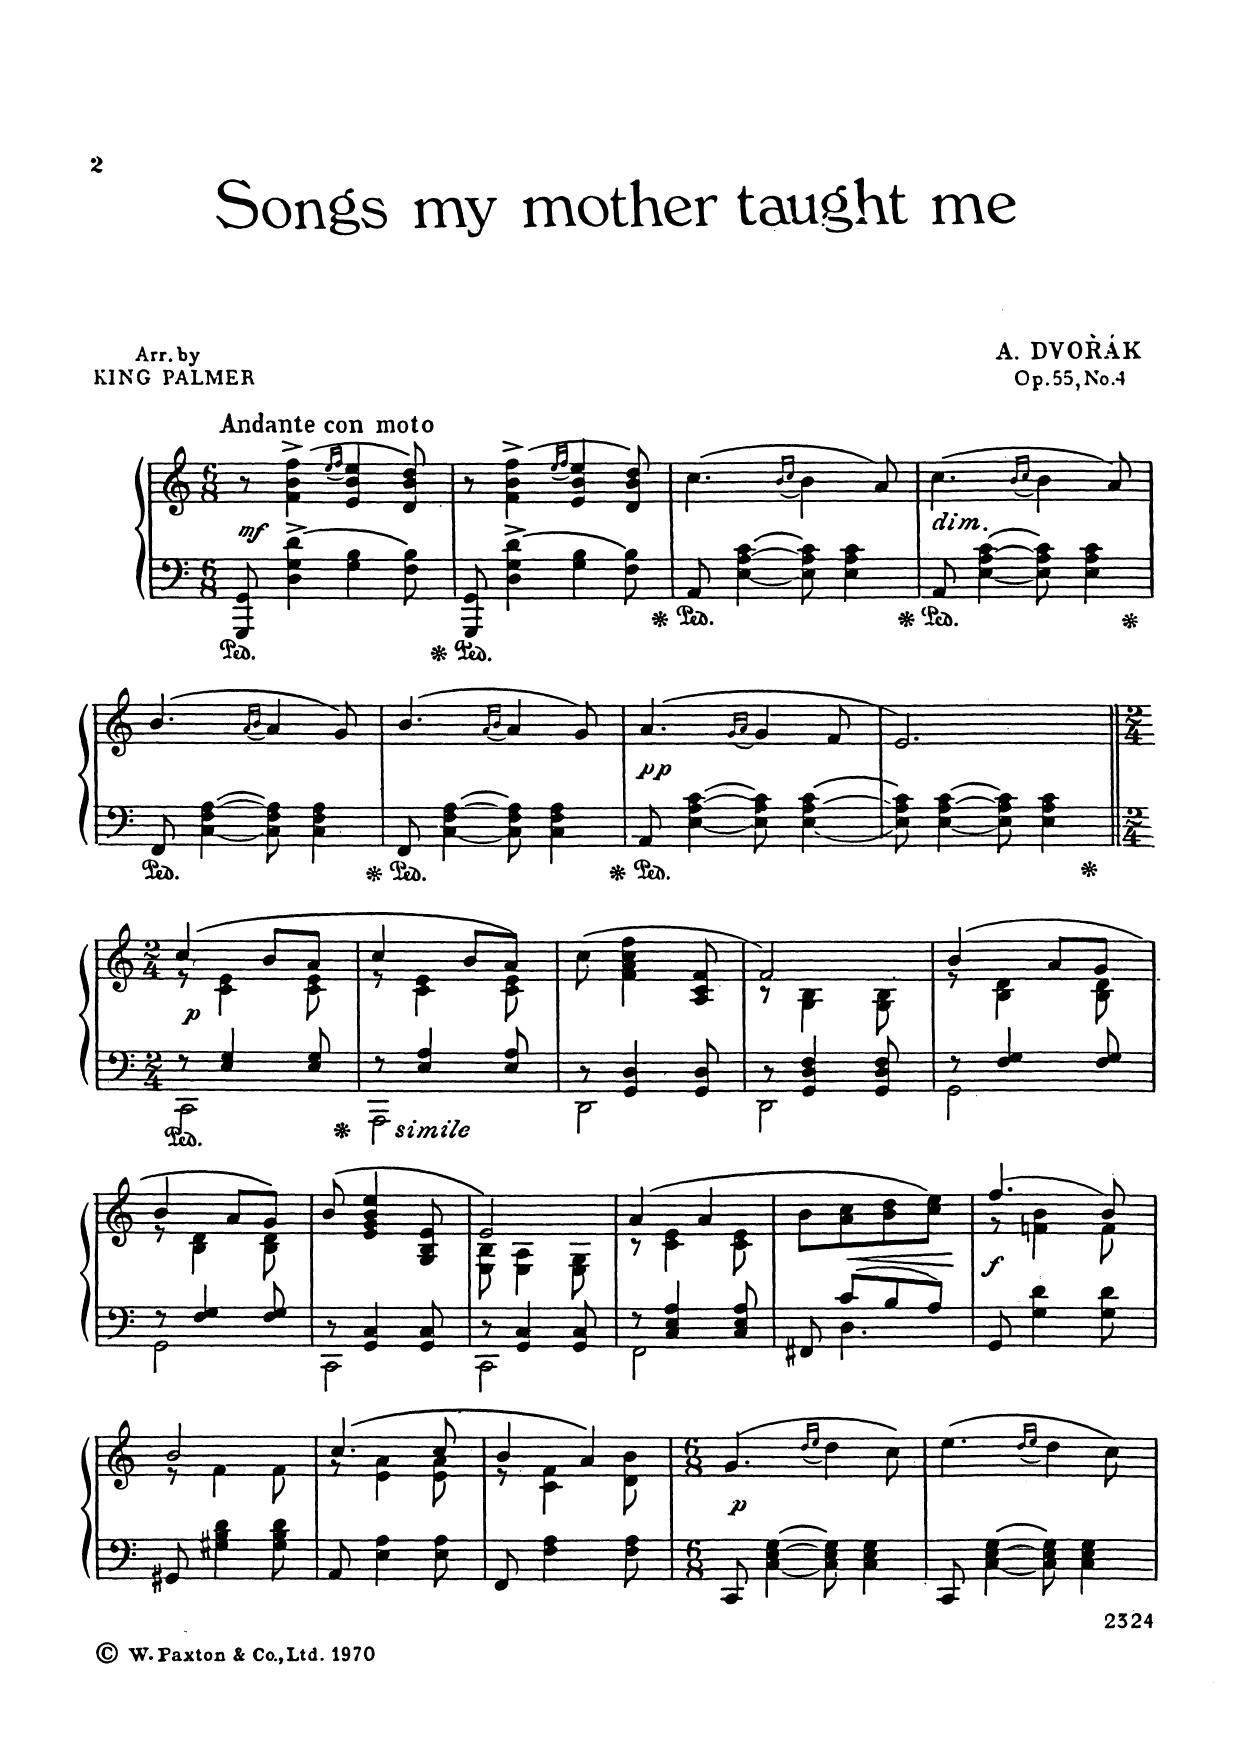 Antonin Dvorak Songs My Mother Taught Me sheet music notes and chords. Download Printable PDF.